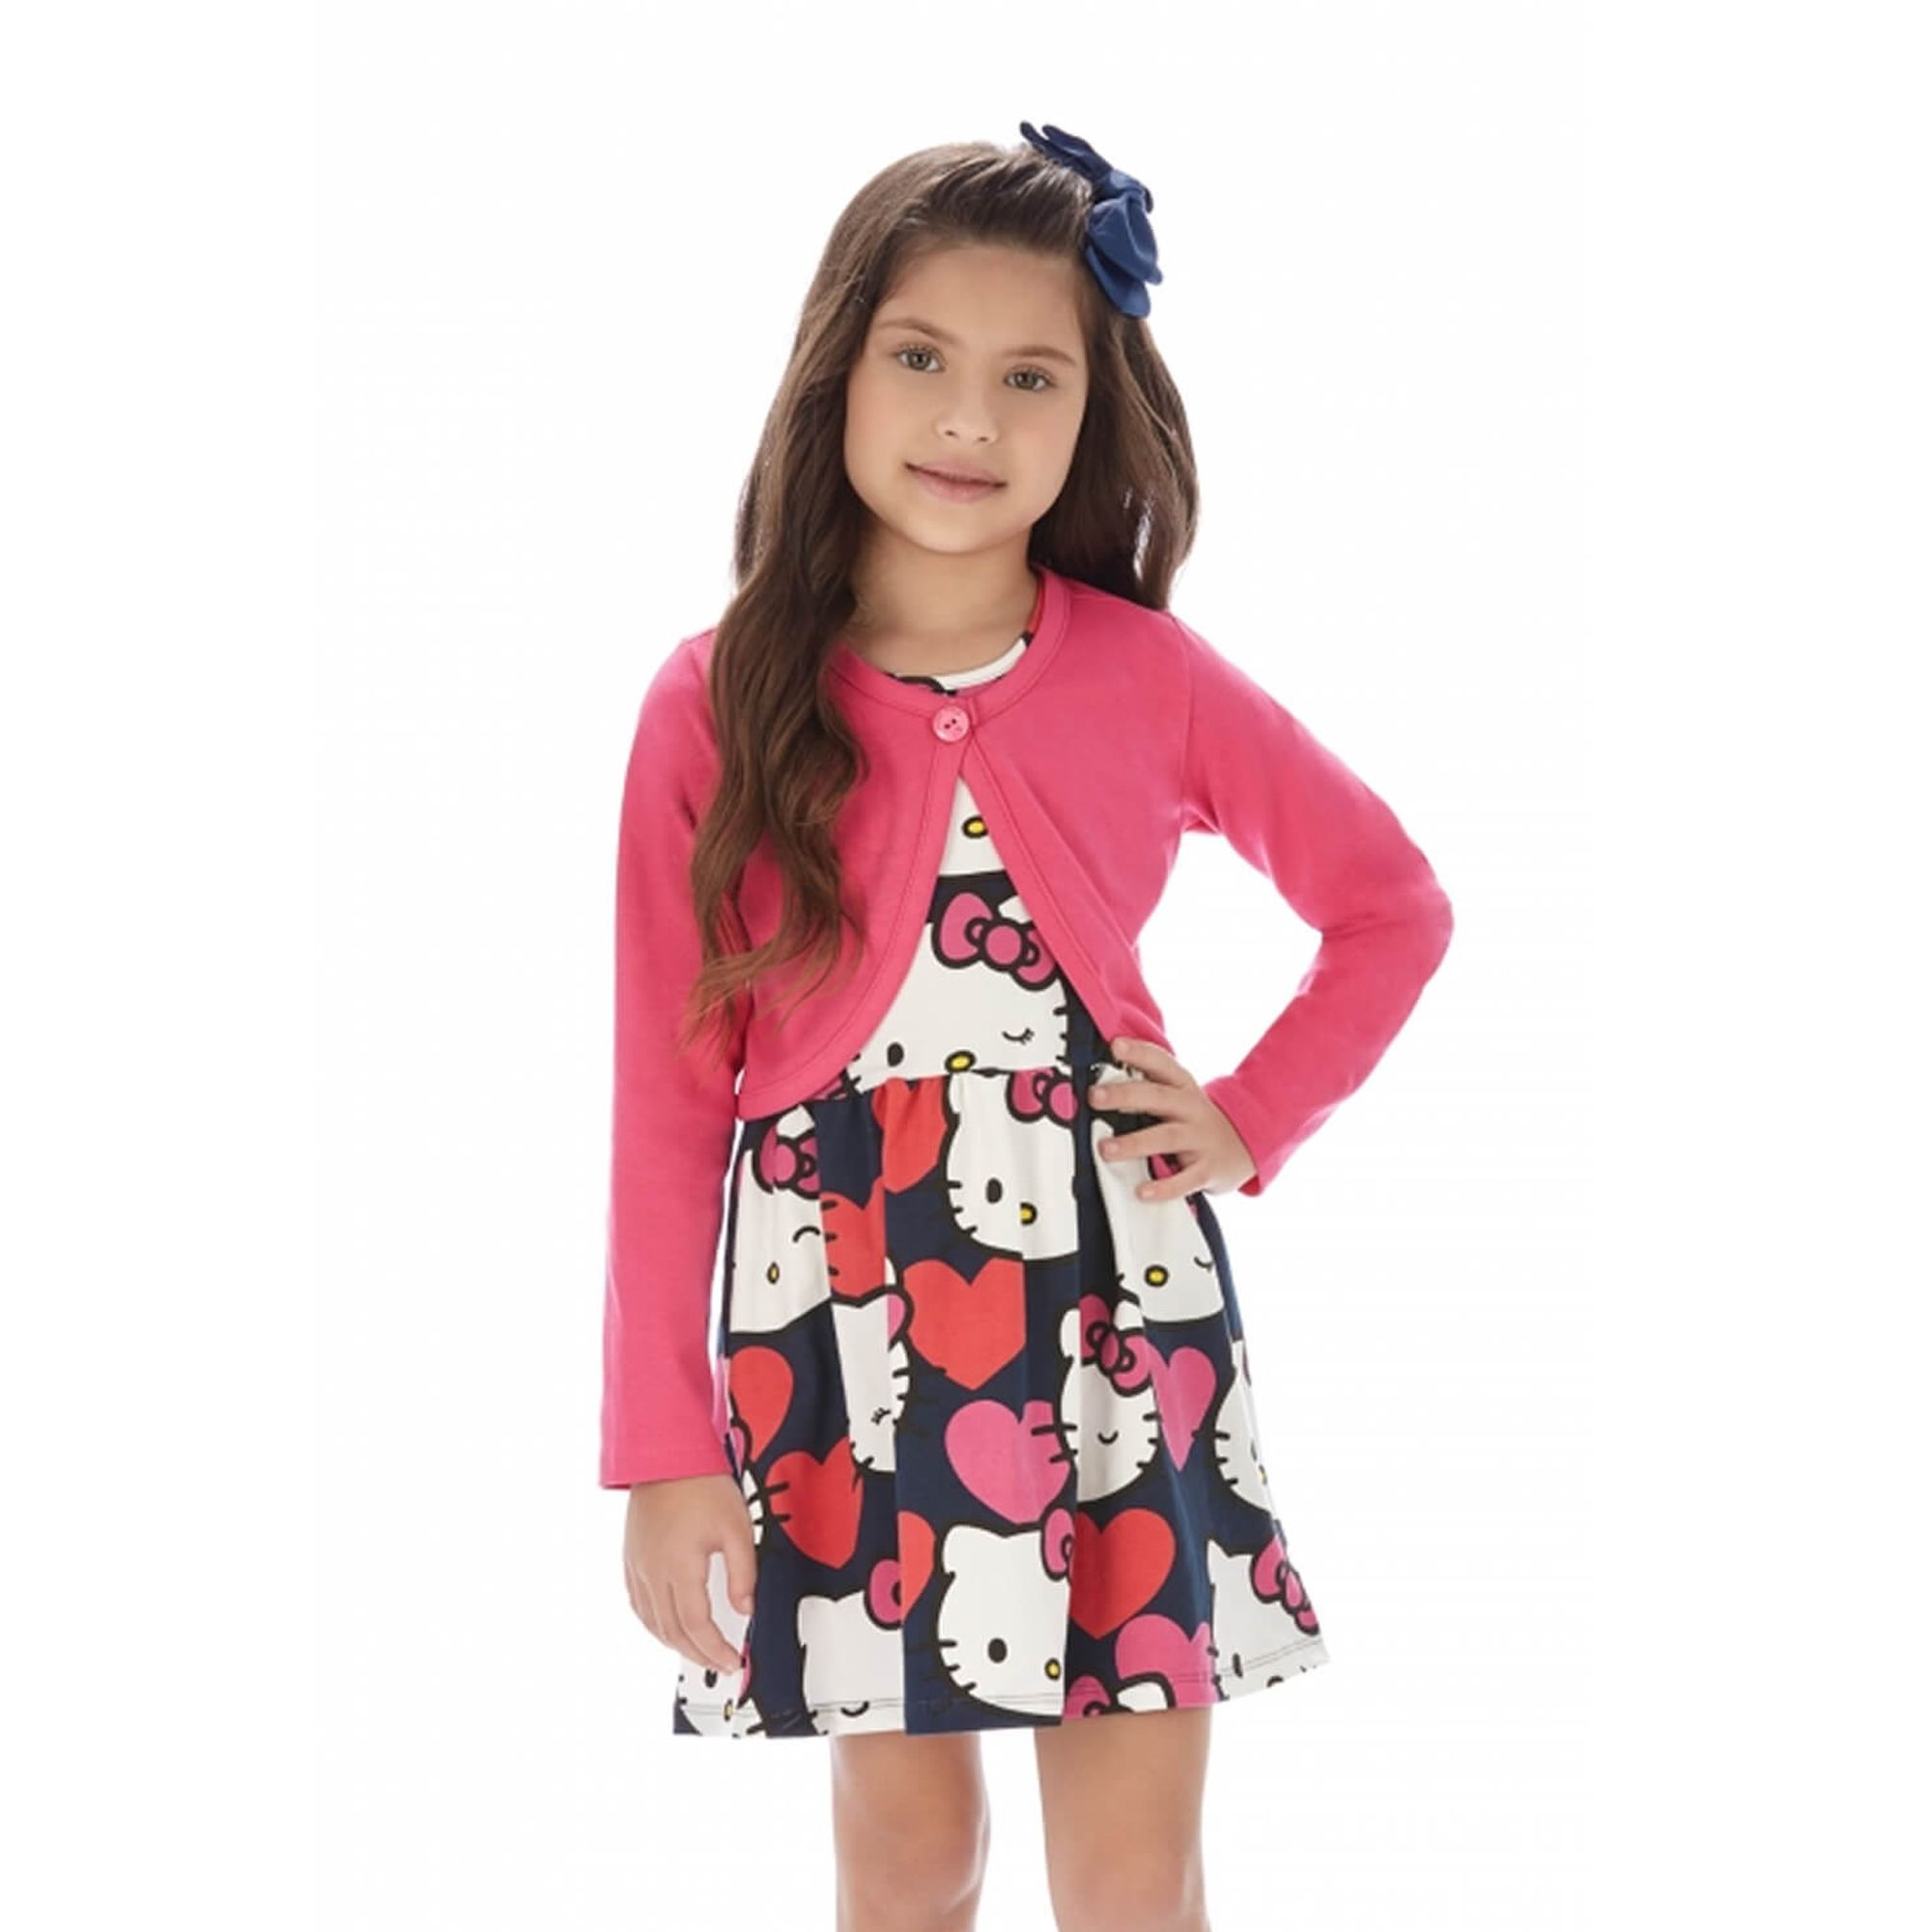 vestido-menina-hello-kitty-e-bolero-pink-em-cotton